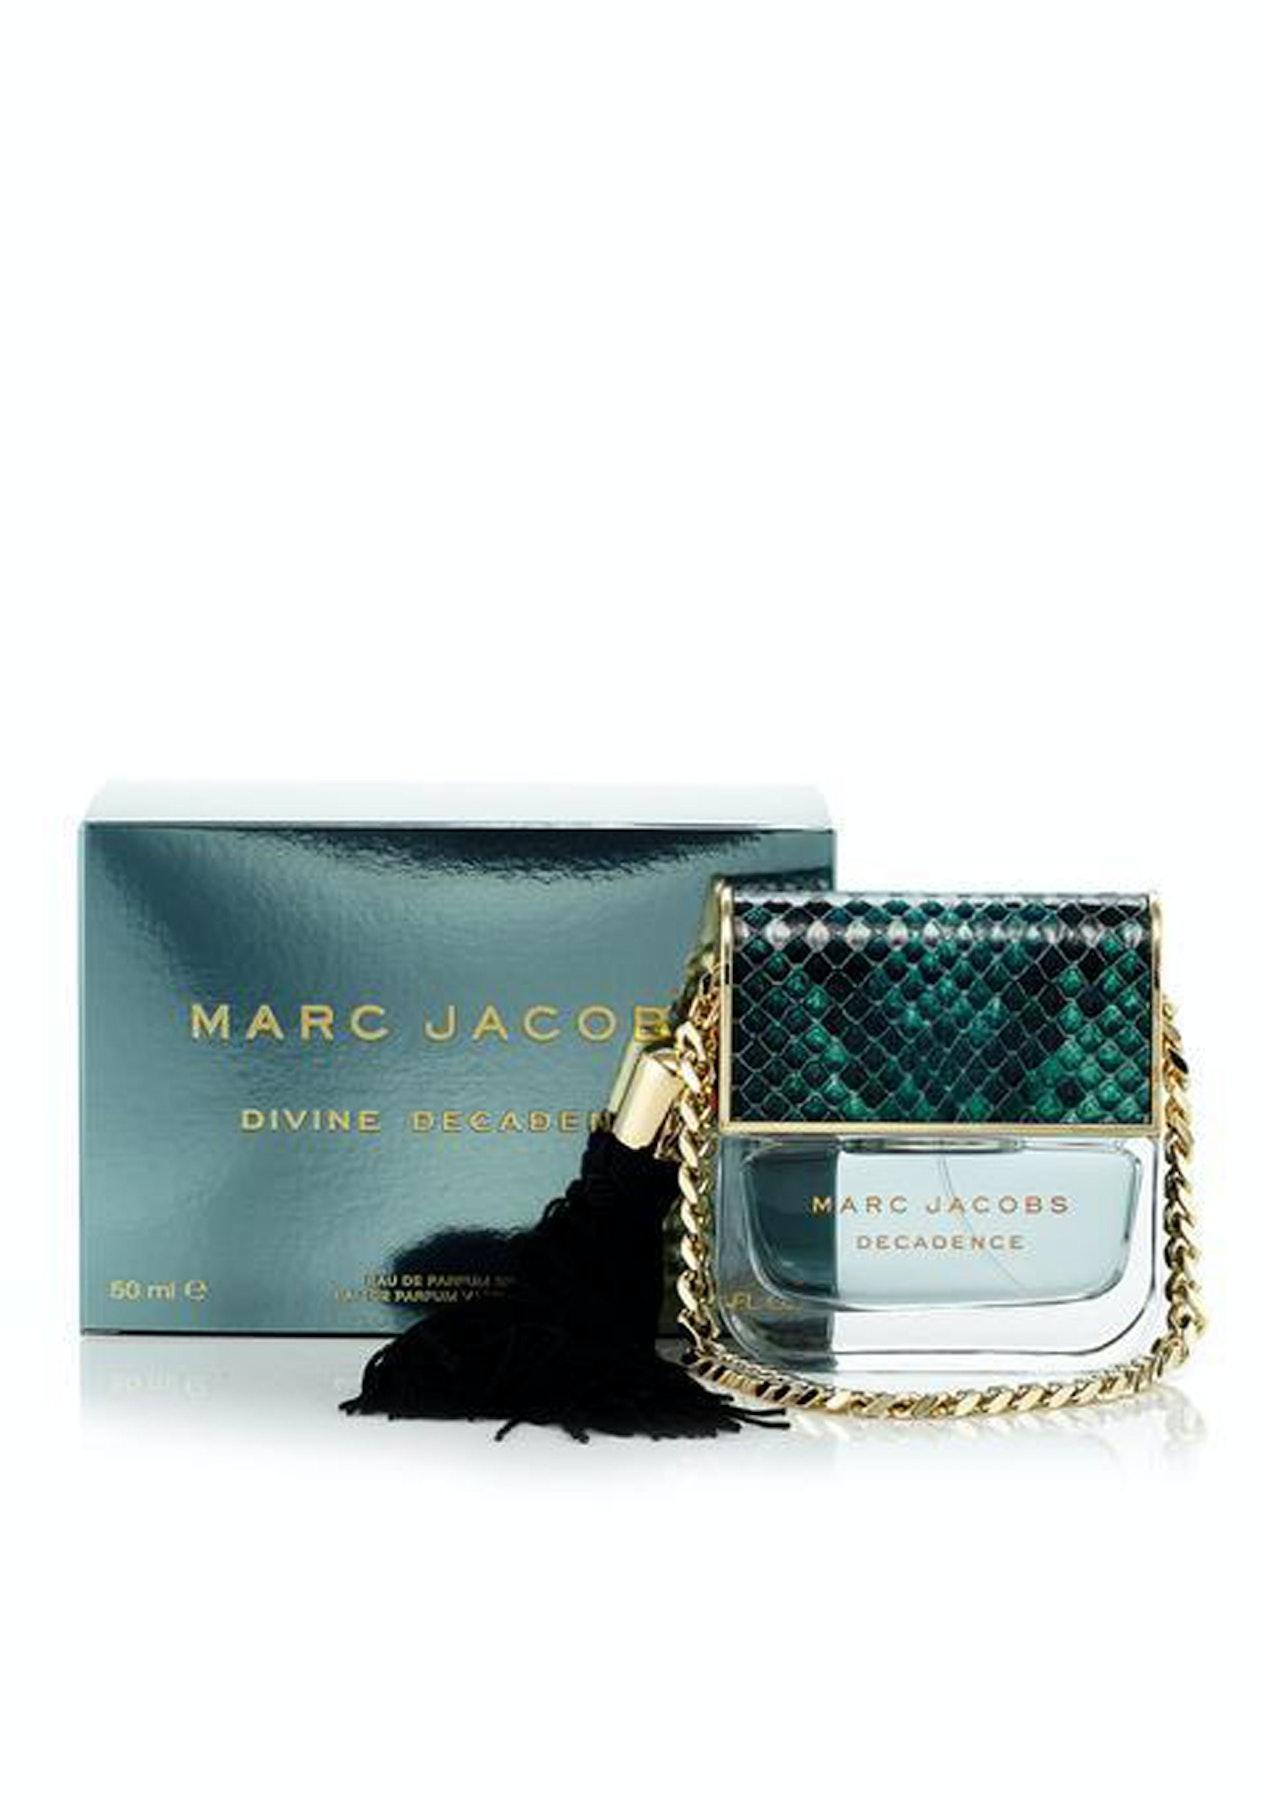 415b7f7a3fad66 Marc Jacobs Divine Decadence 50ml EDP - Fragrance Gift ideas - Onceit